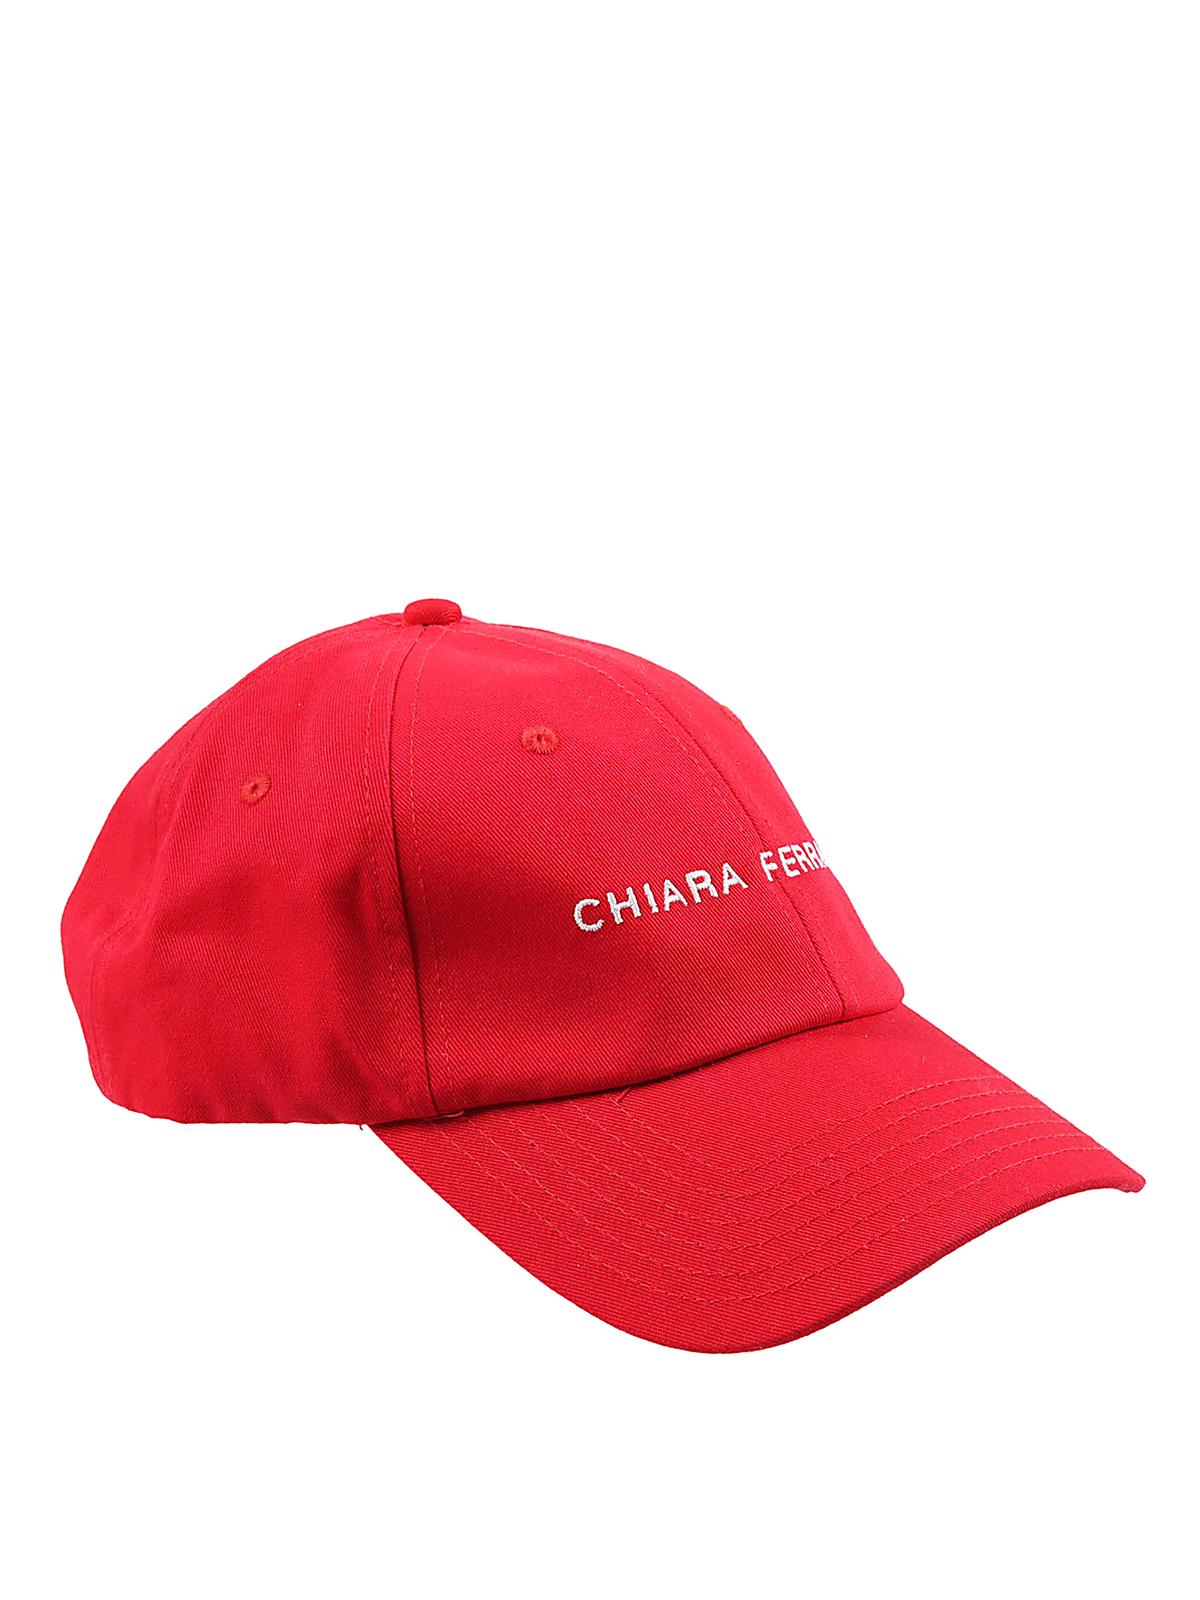 2f3425dd Chiara Ferragni - Active baseball cap - hats & caps - CFC016ROSSO